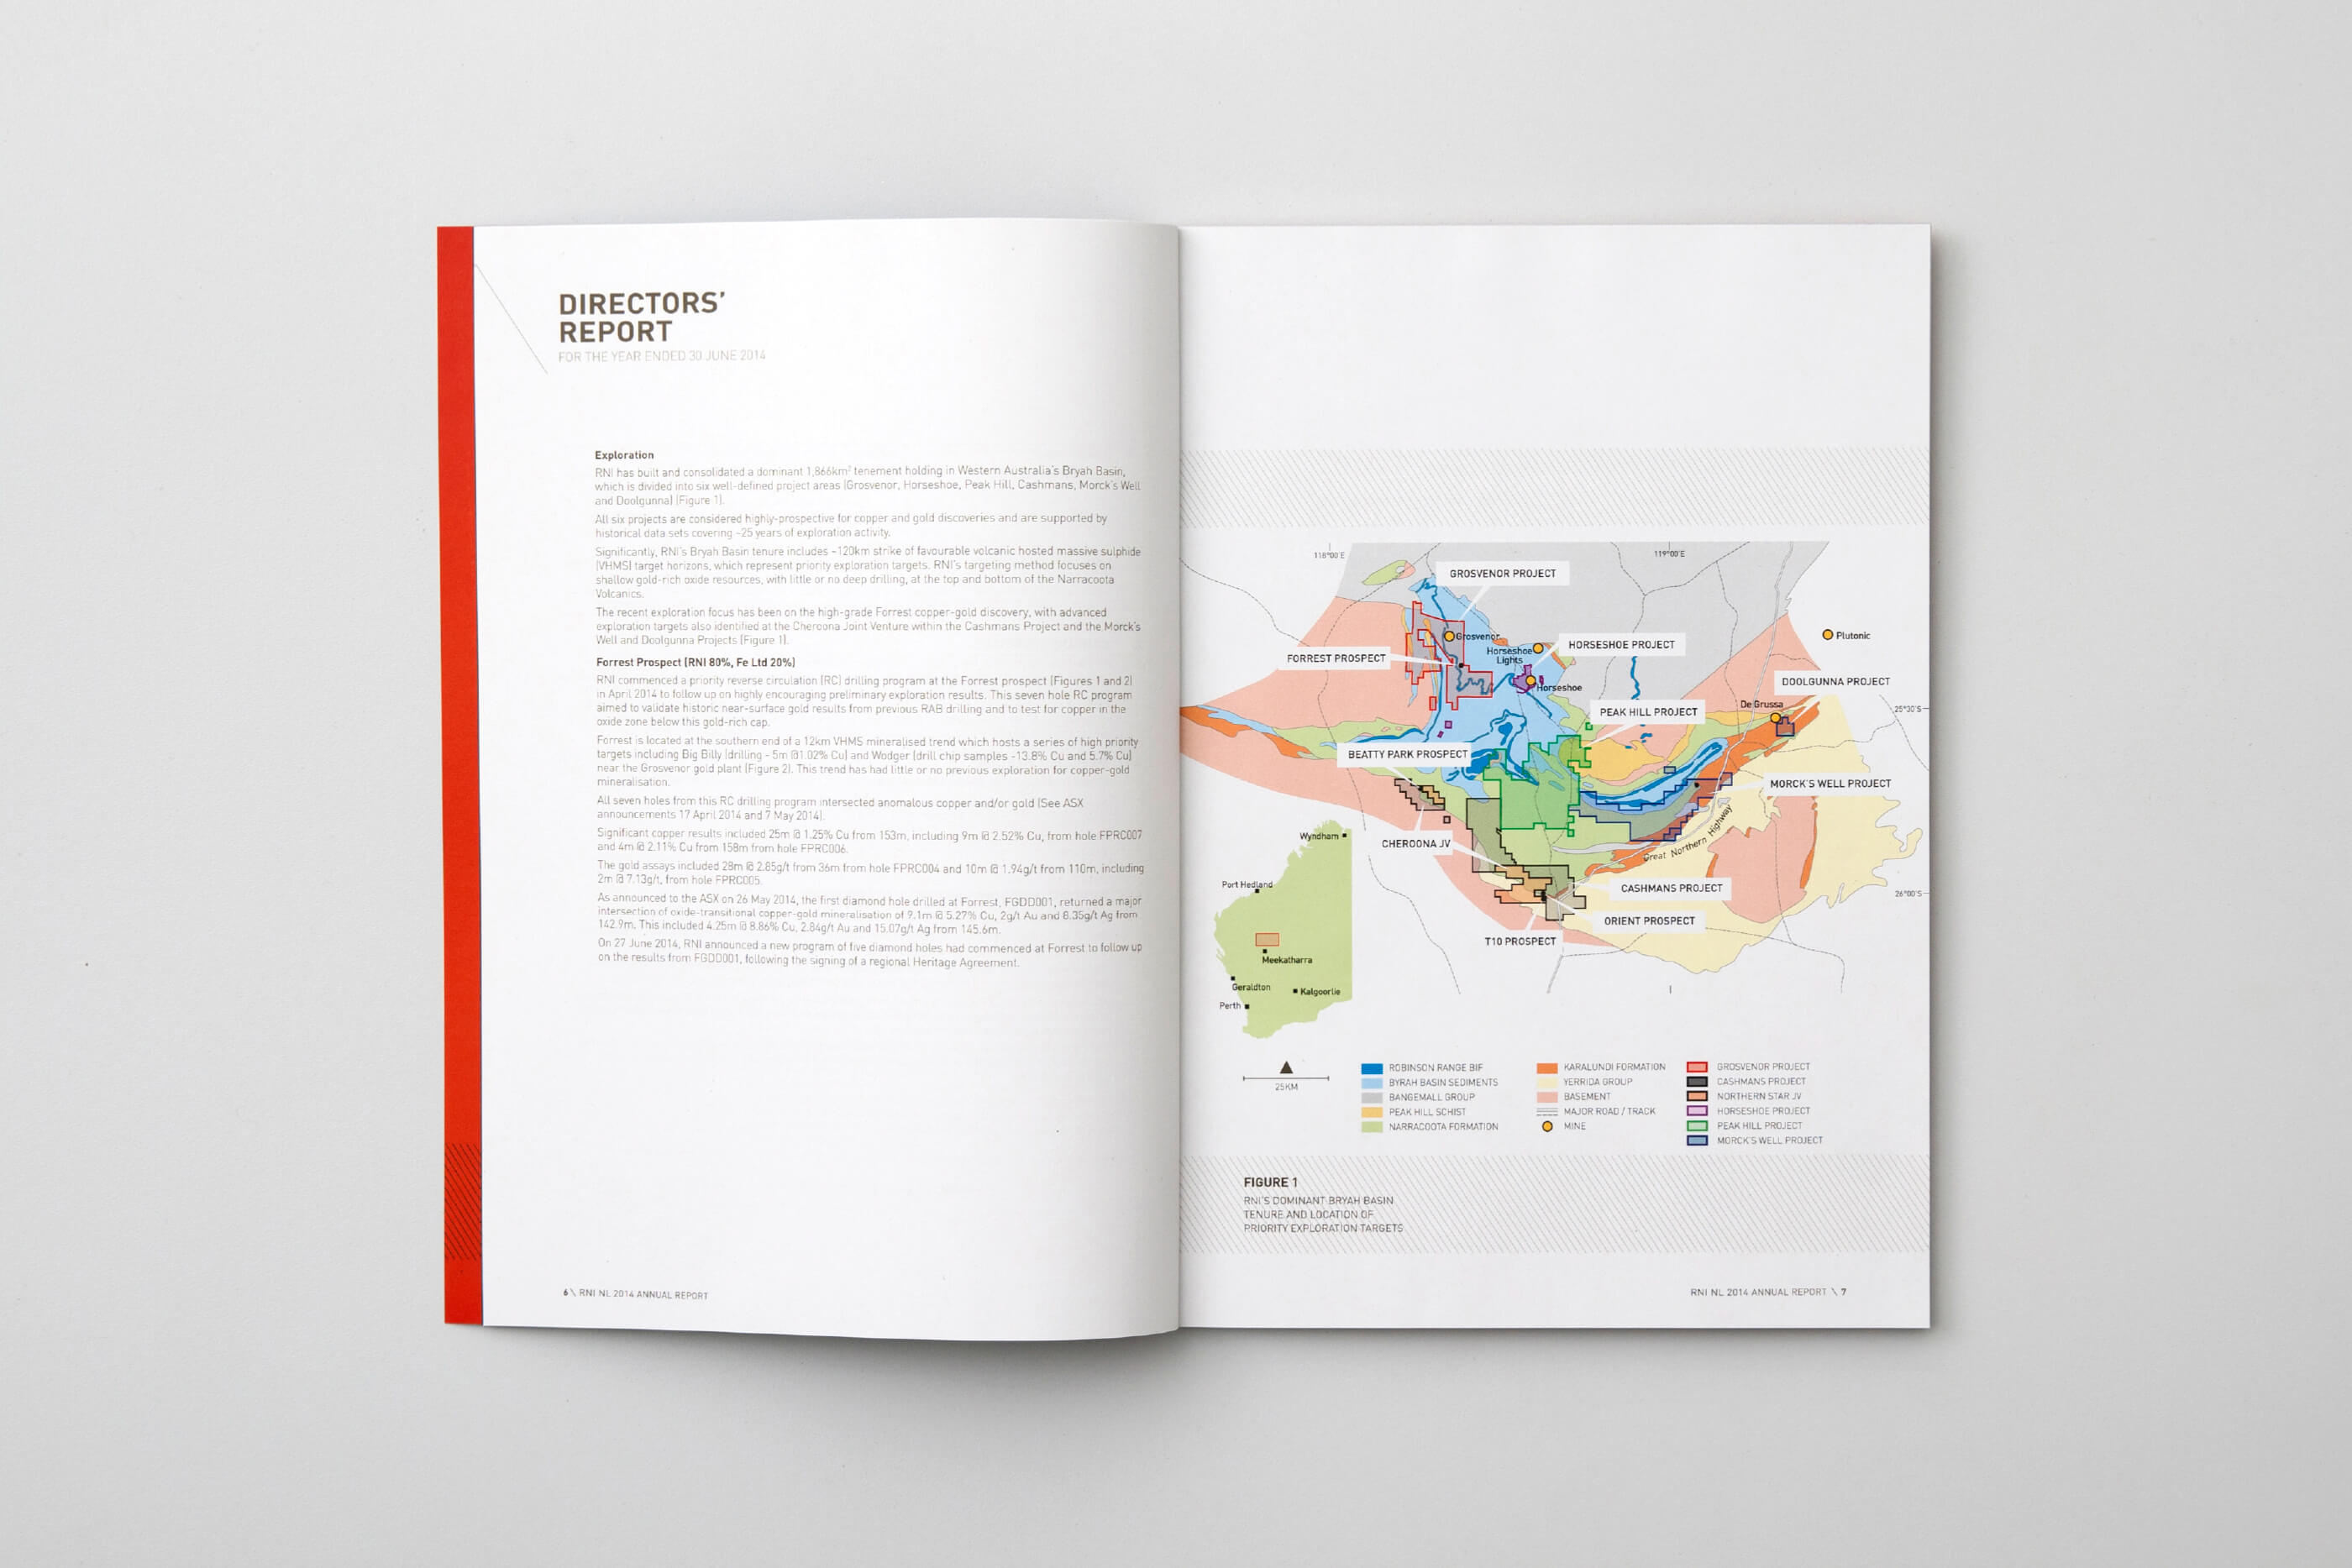 rni_annual_report_7